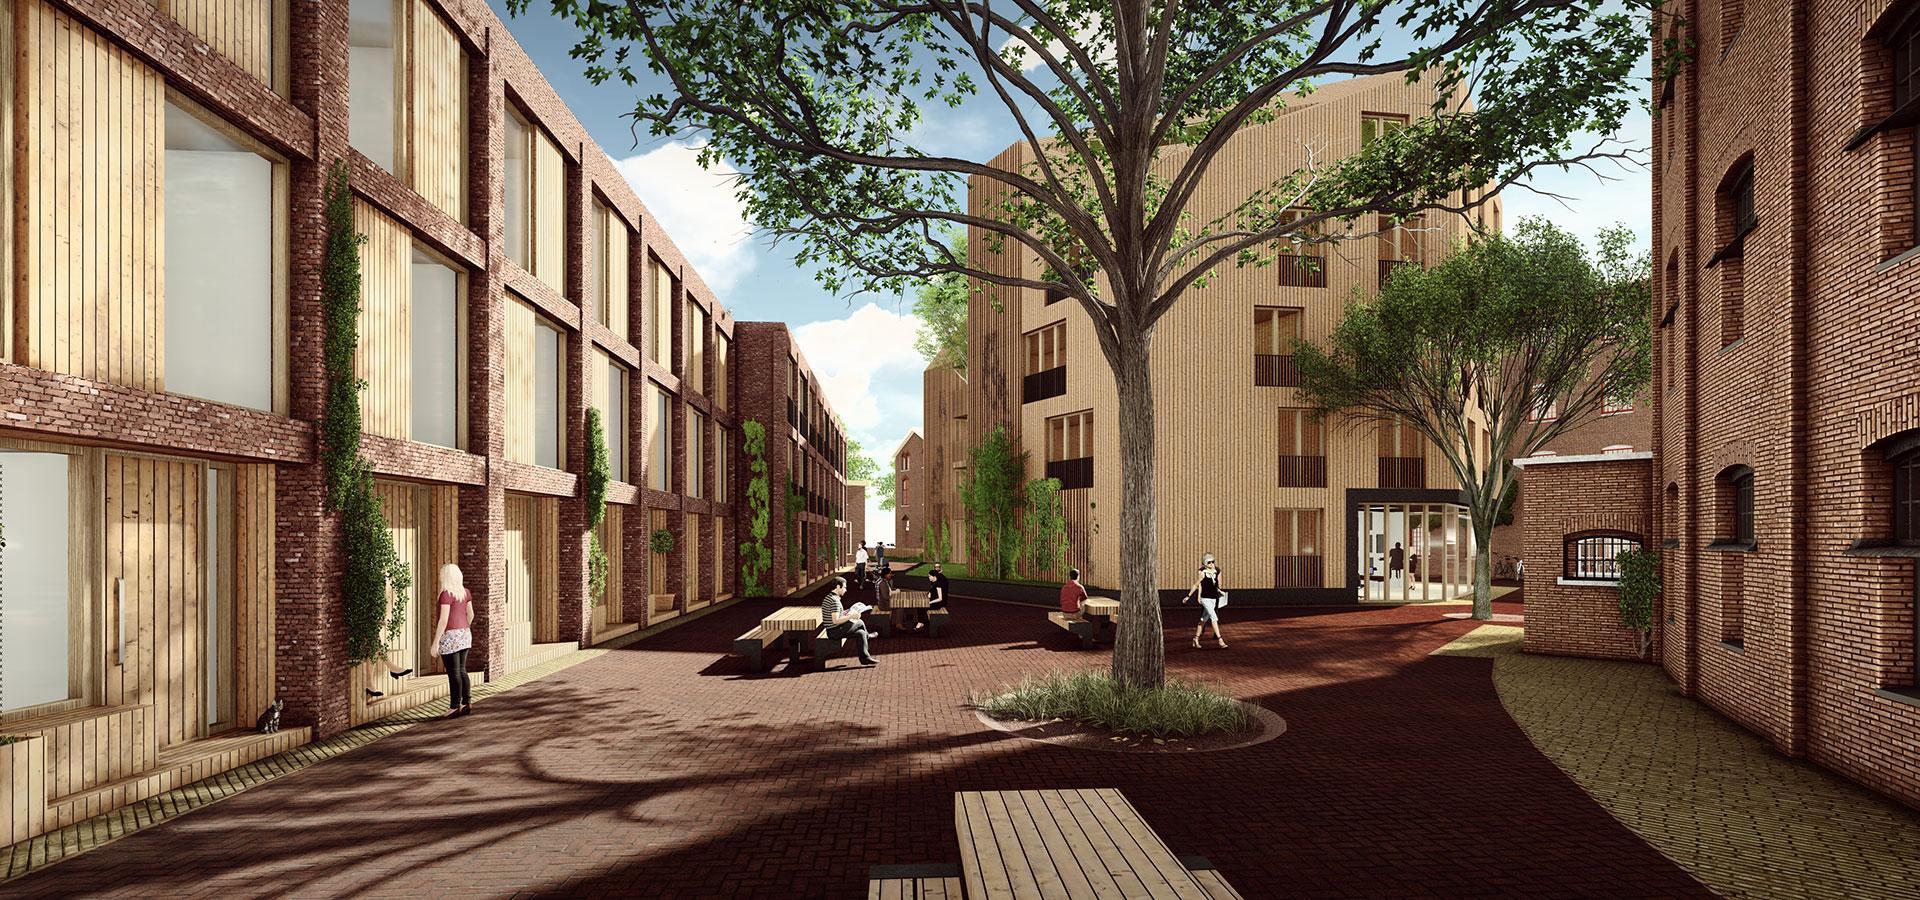 FARO architecten Koepel Haarlem 06